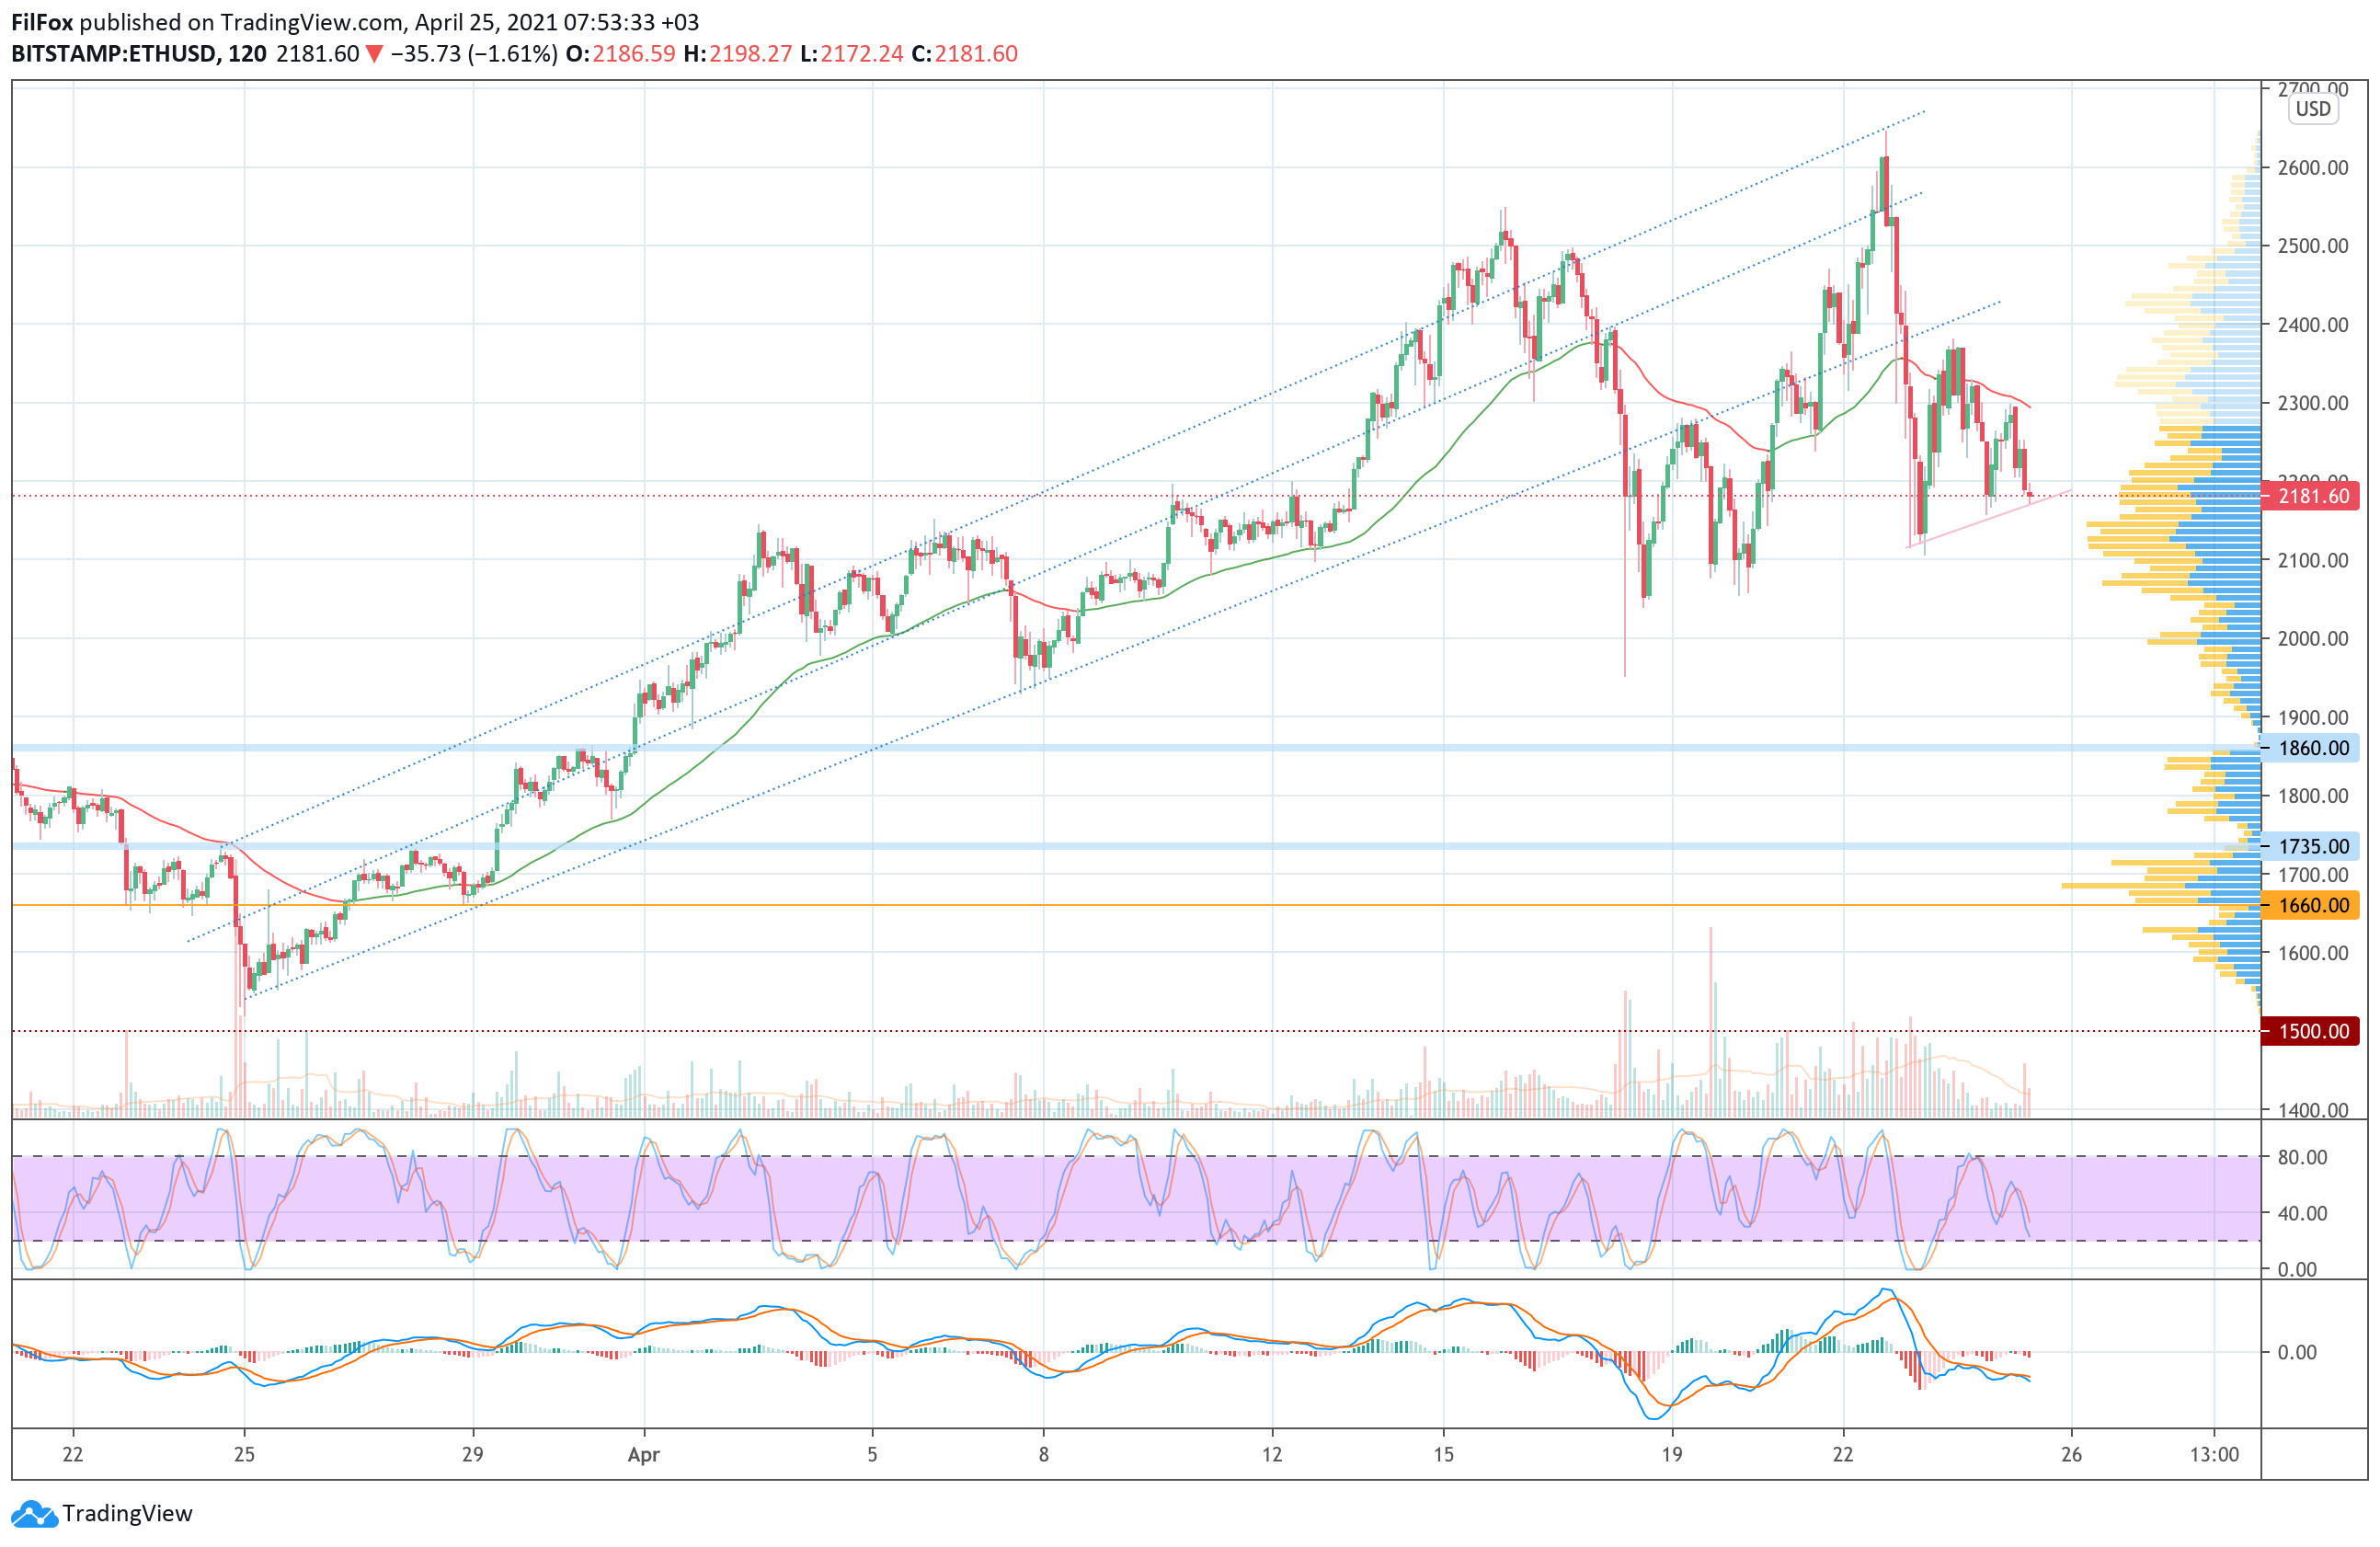 Анализ цен Bitcoin, Ethereum, XRP на 25.04.2021